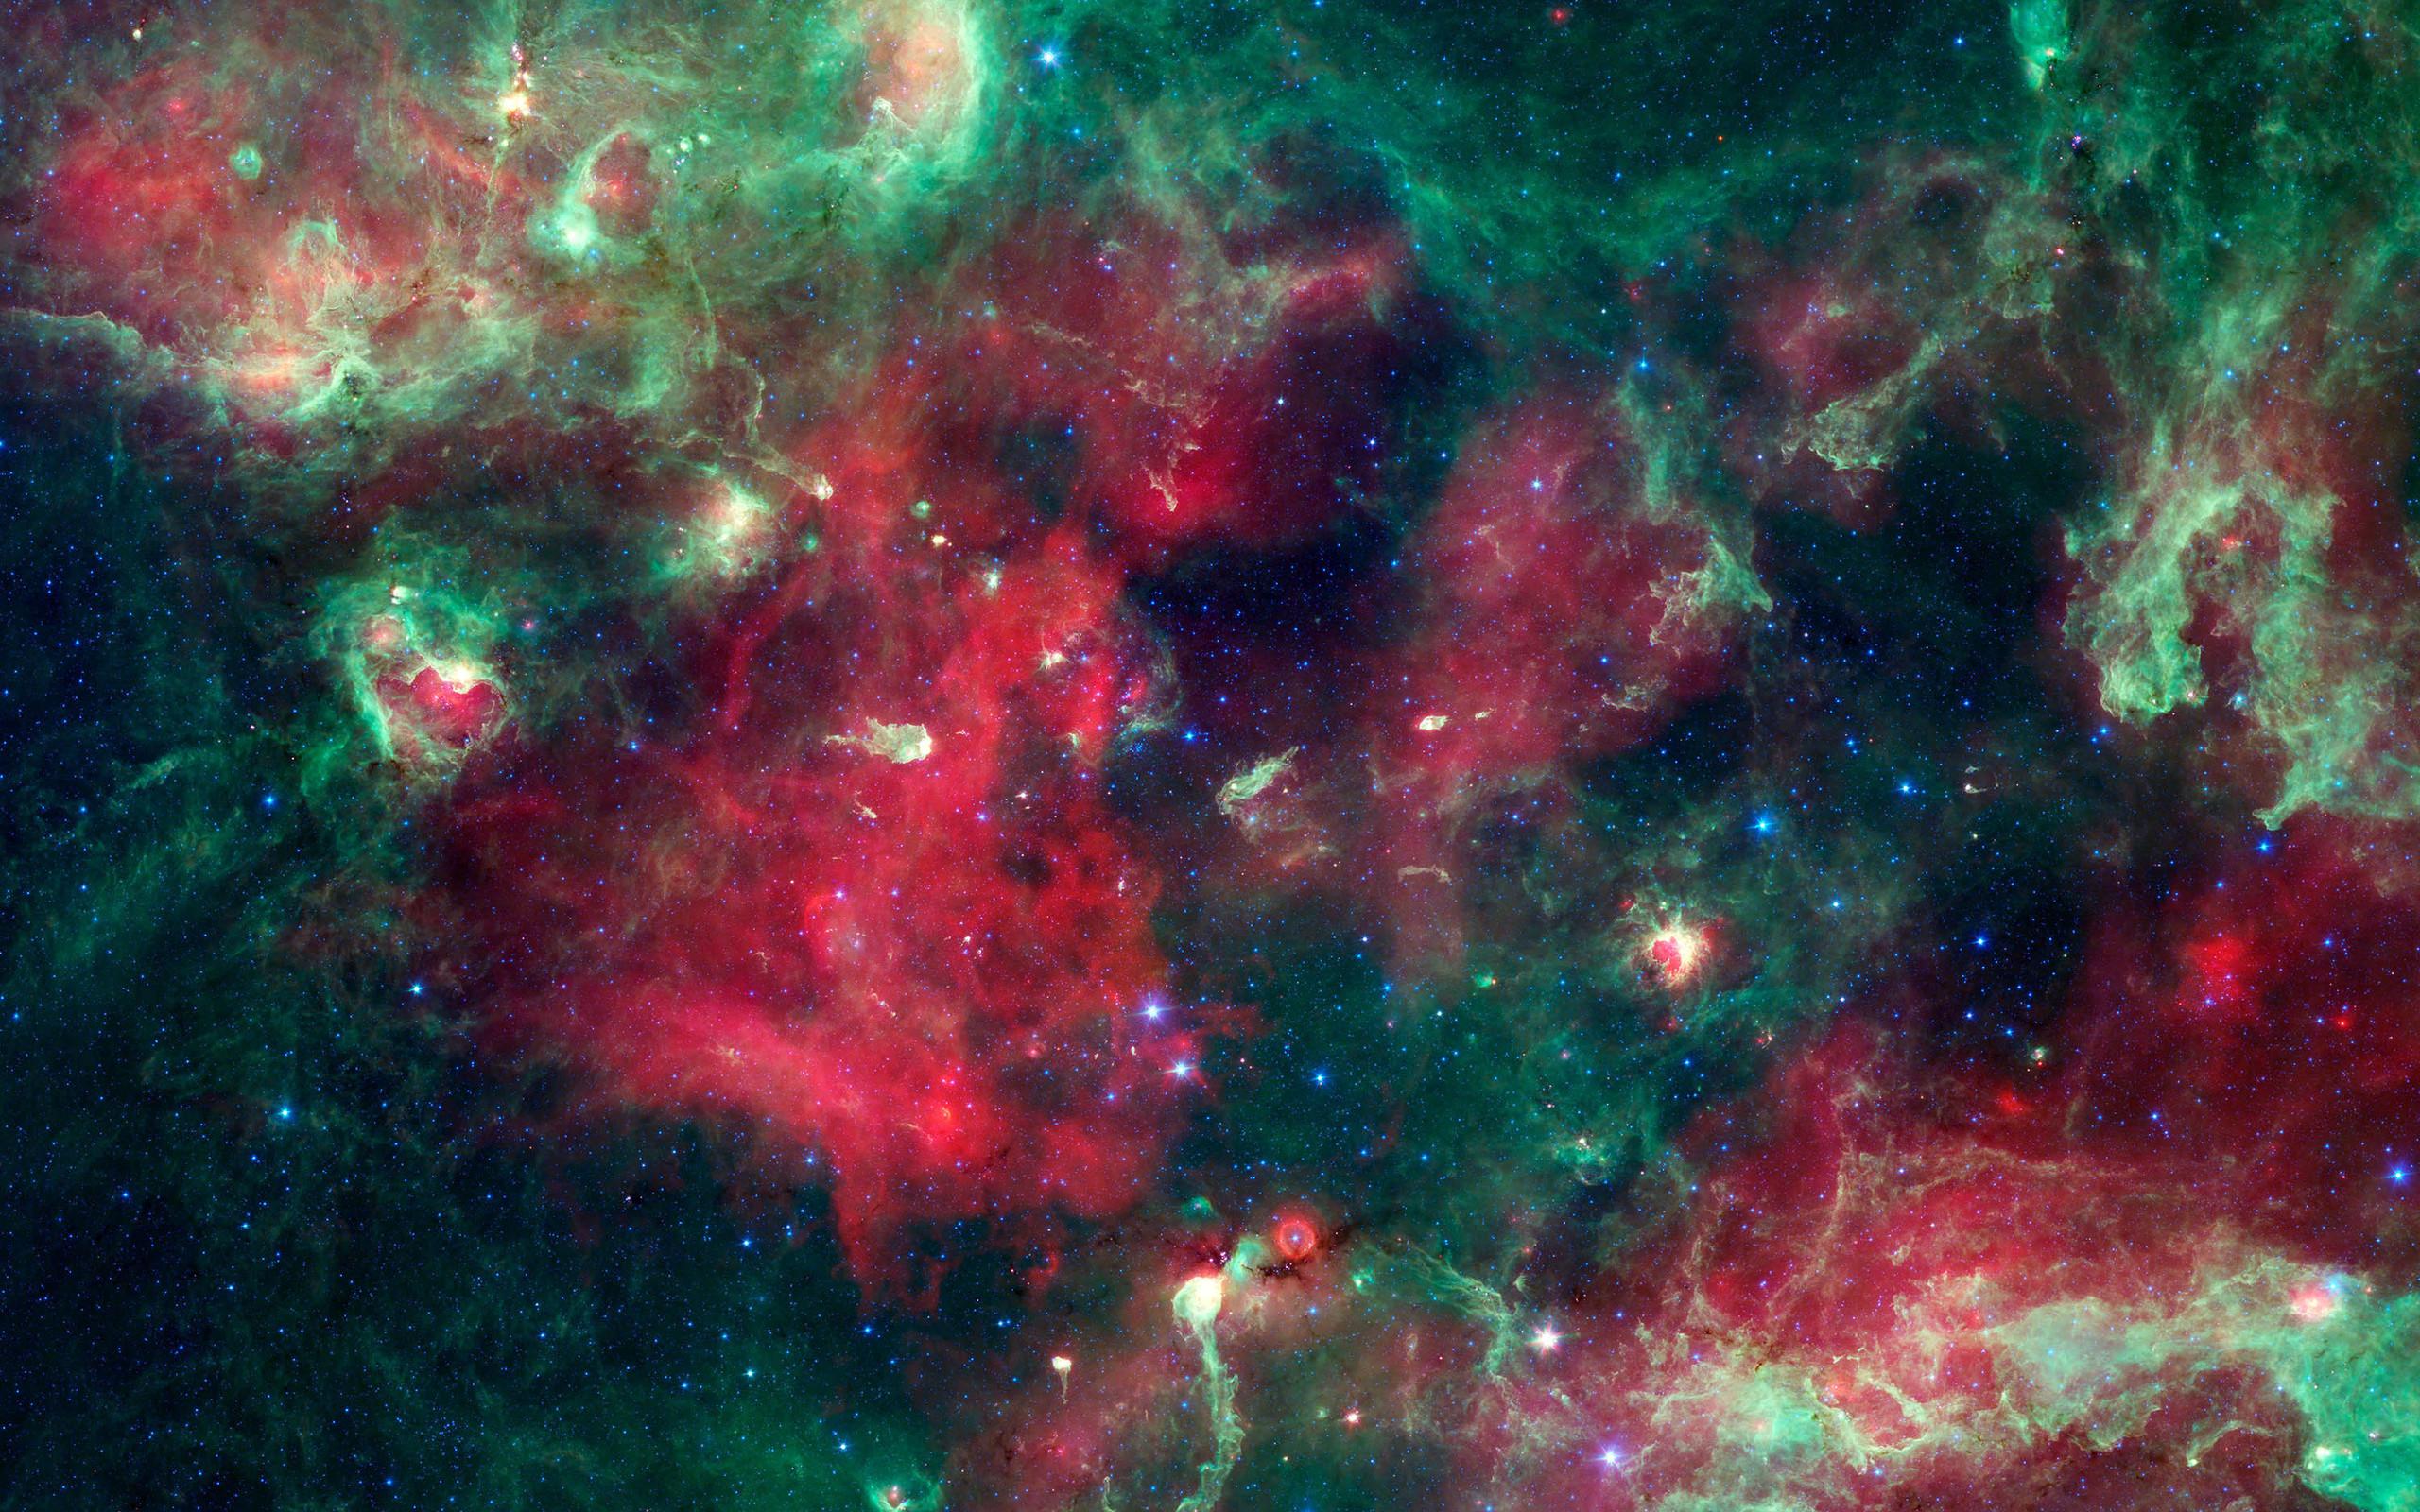 Nebula Computer Wallpapers Desktop Backgrounds 2560x1600 ID 2560x1600